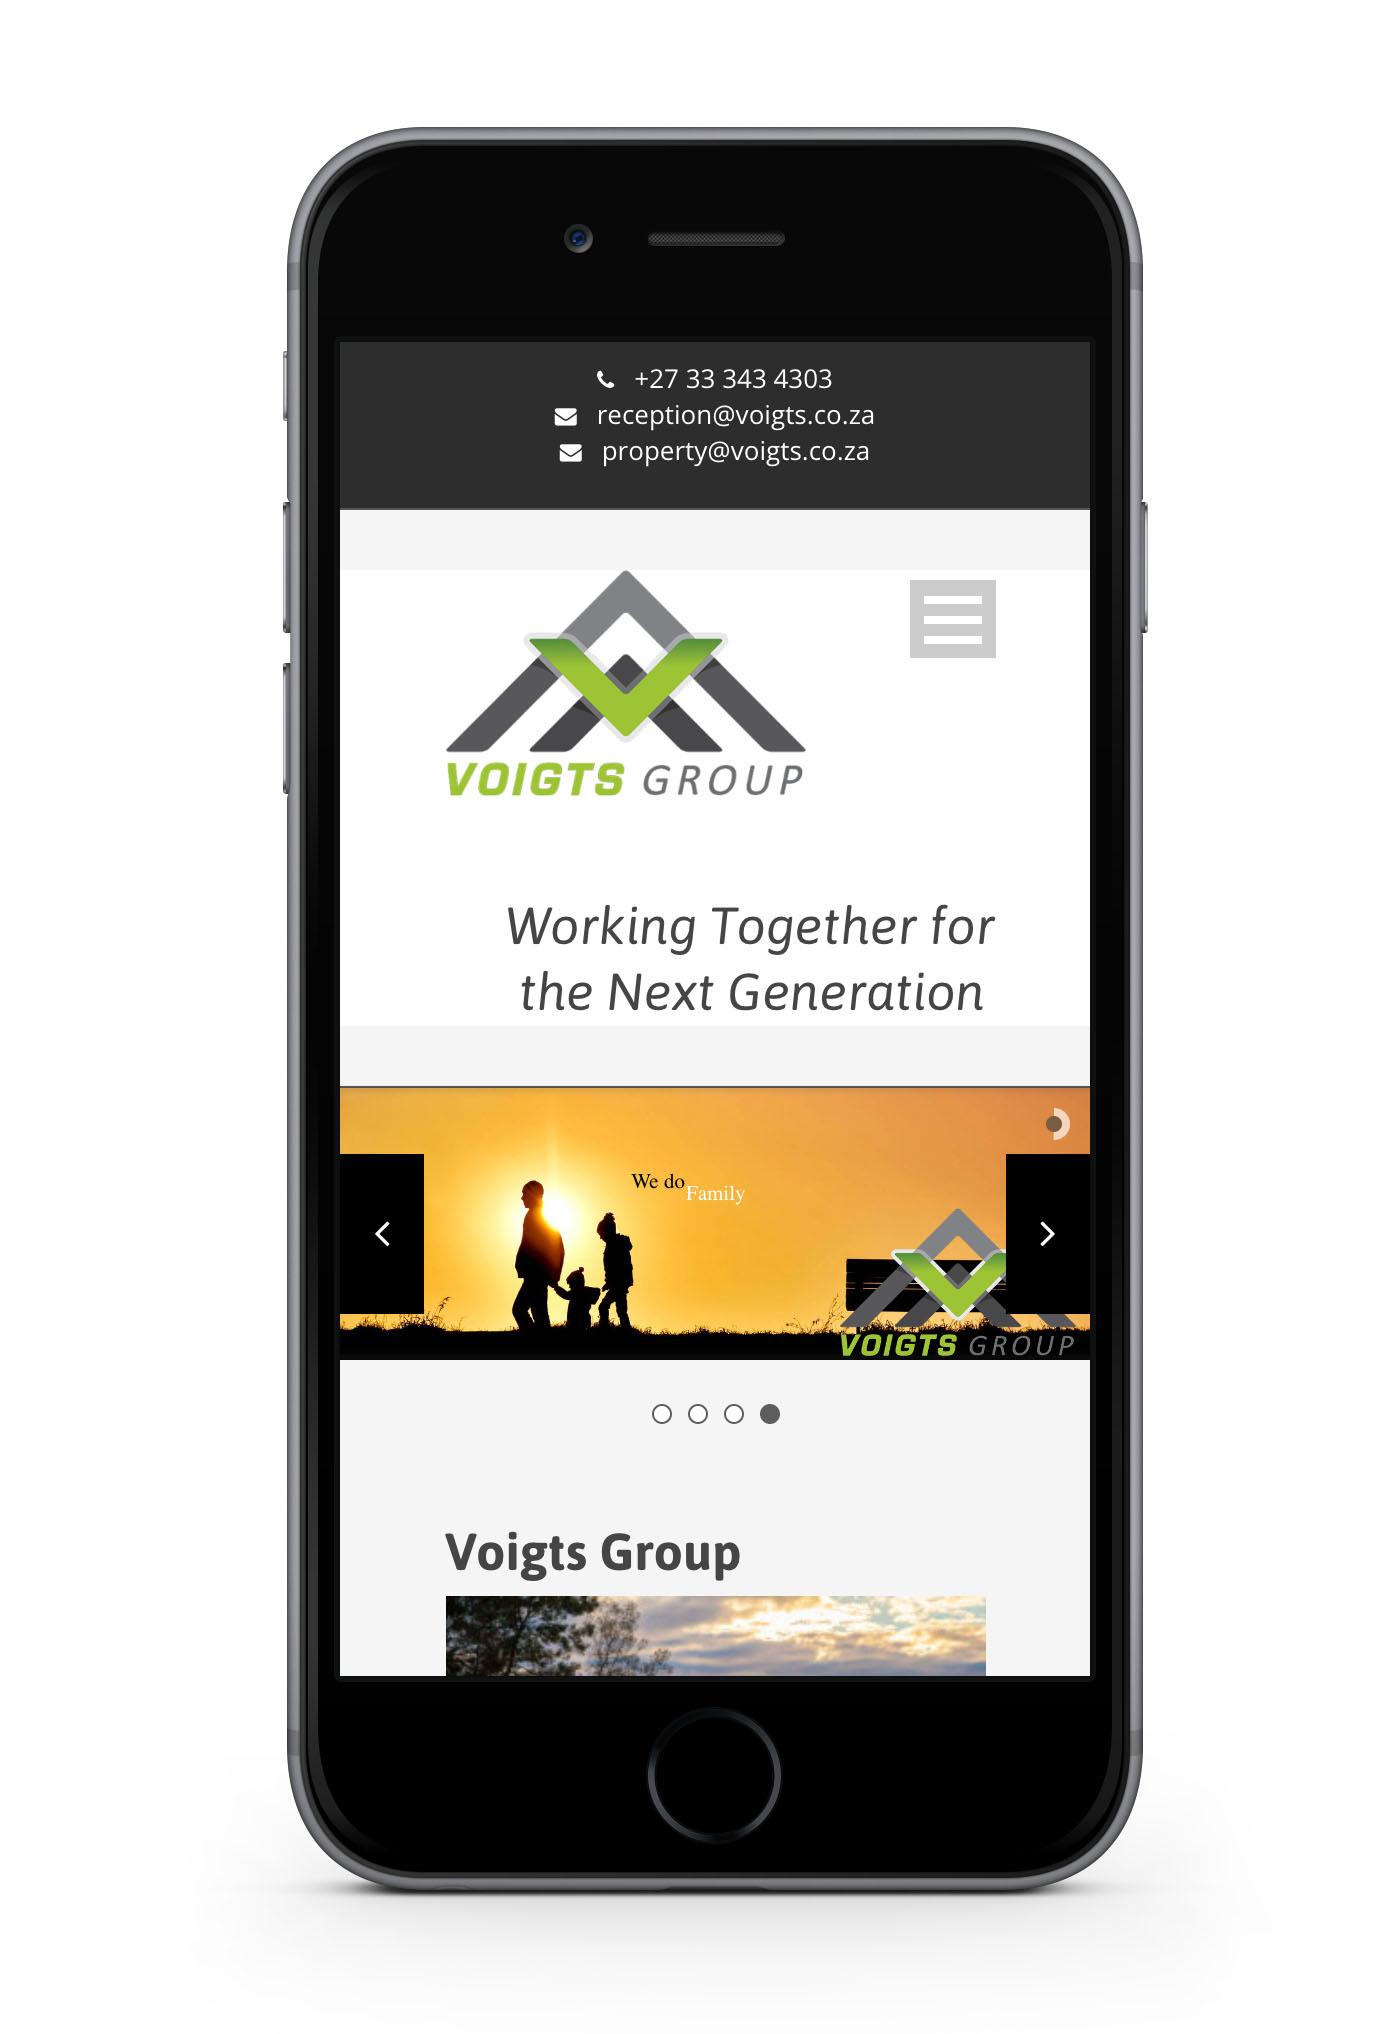 voigts group web-design-portfolio-webdoor-responsive-web-design-agency-hillcrest-kwazulu-natal-phone